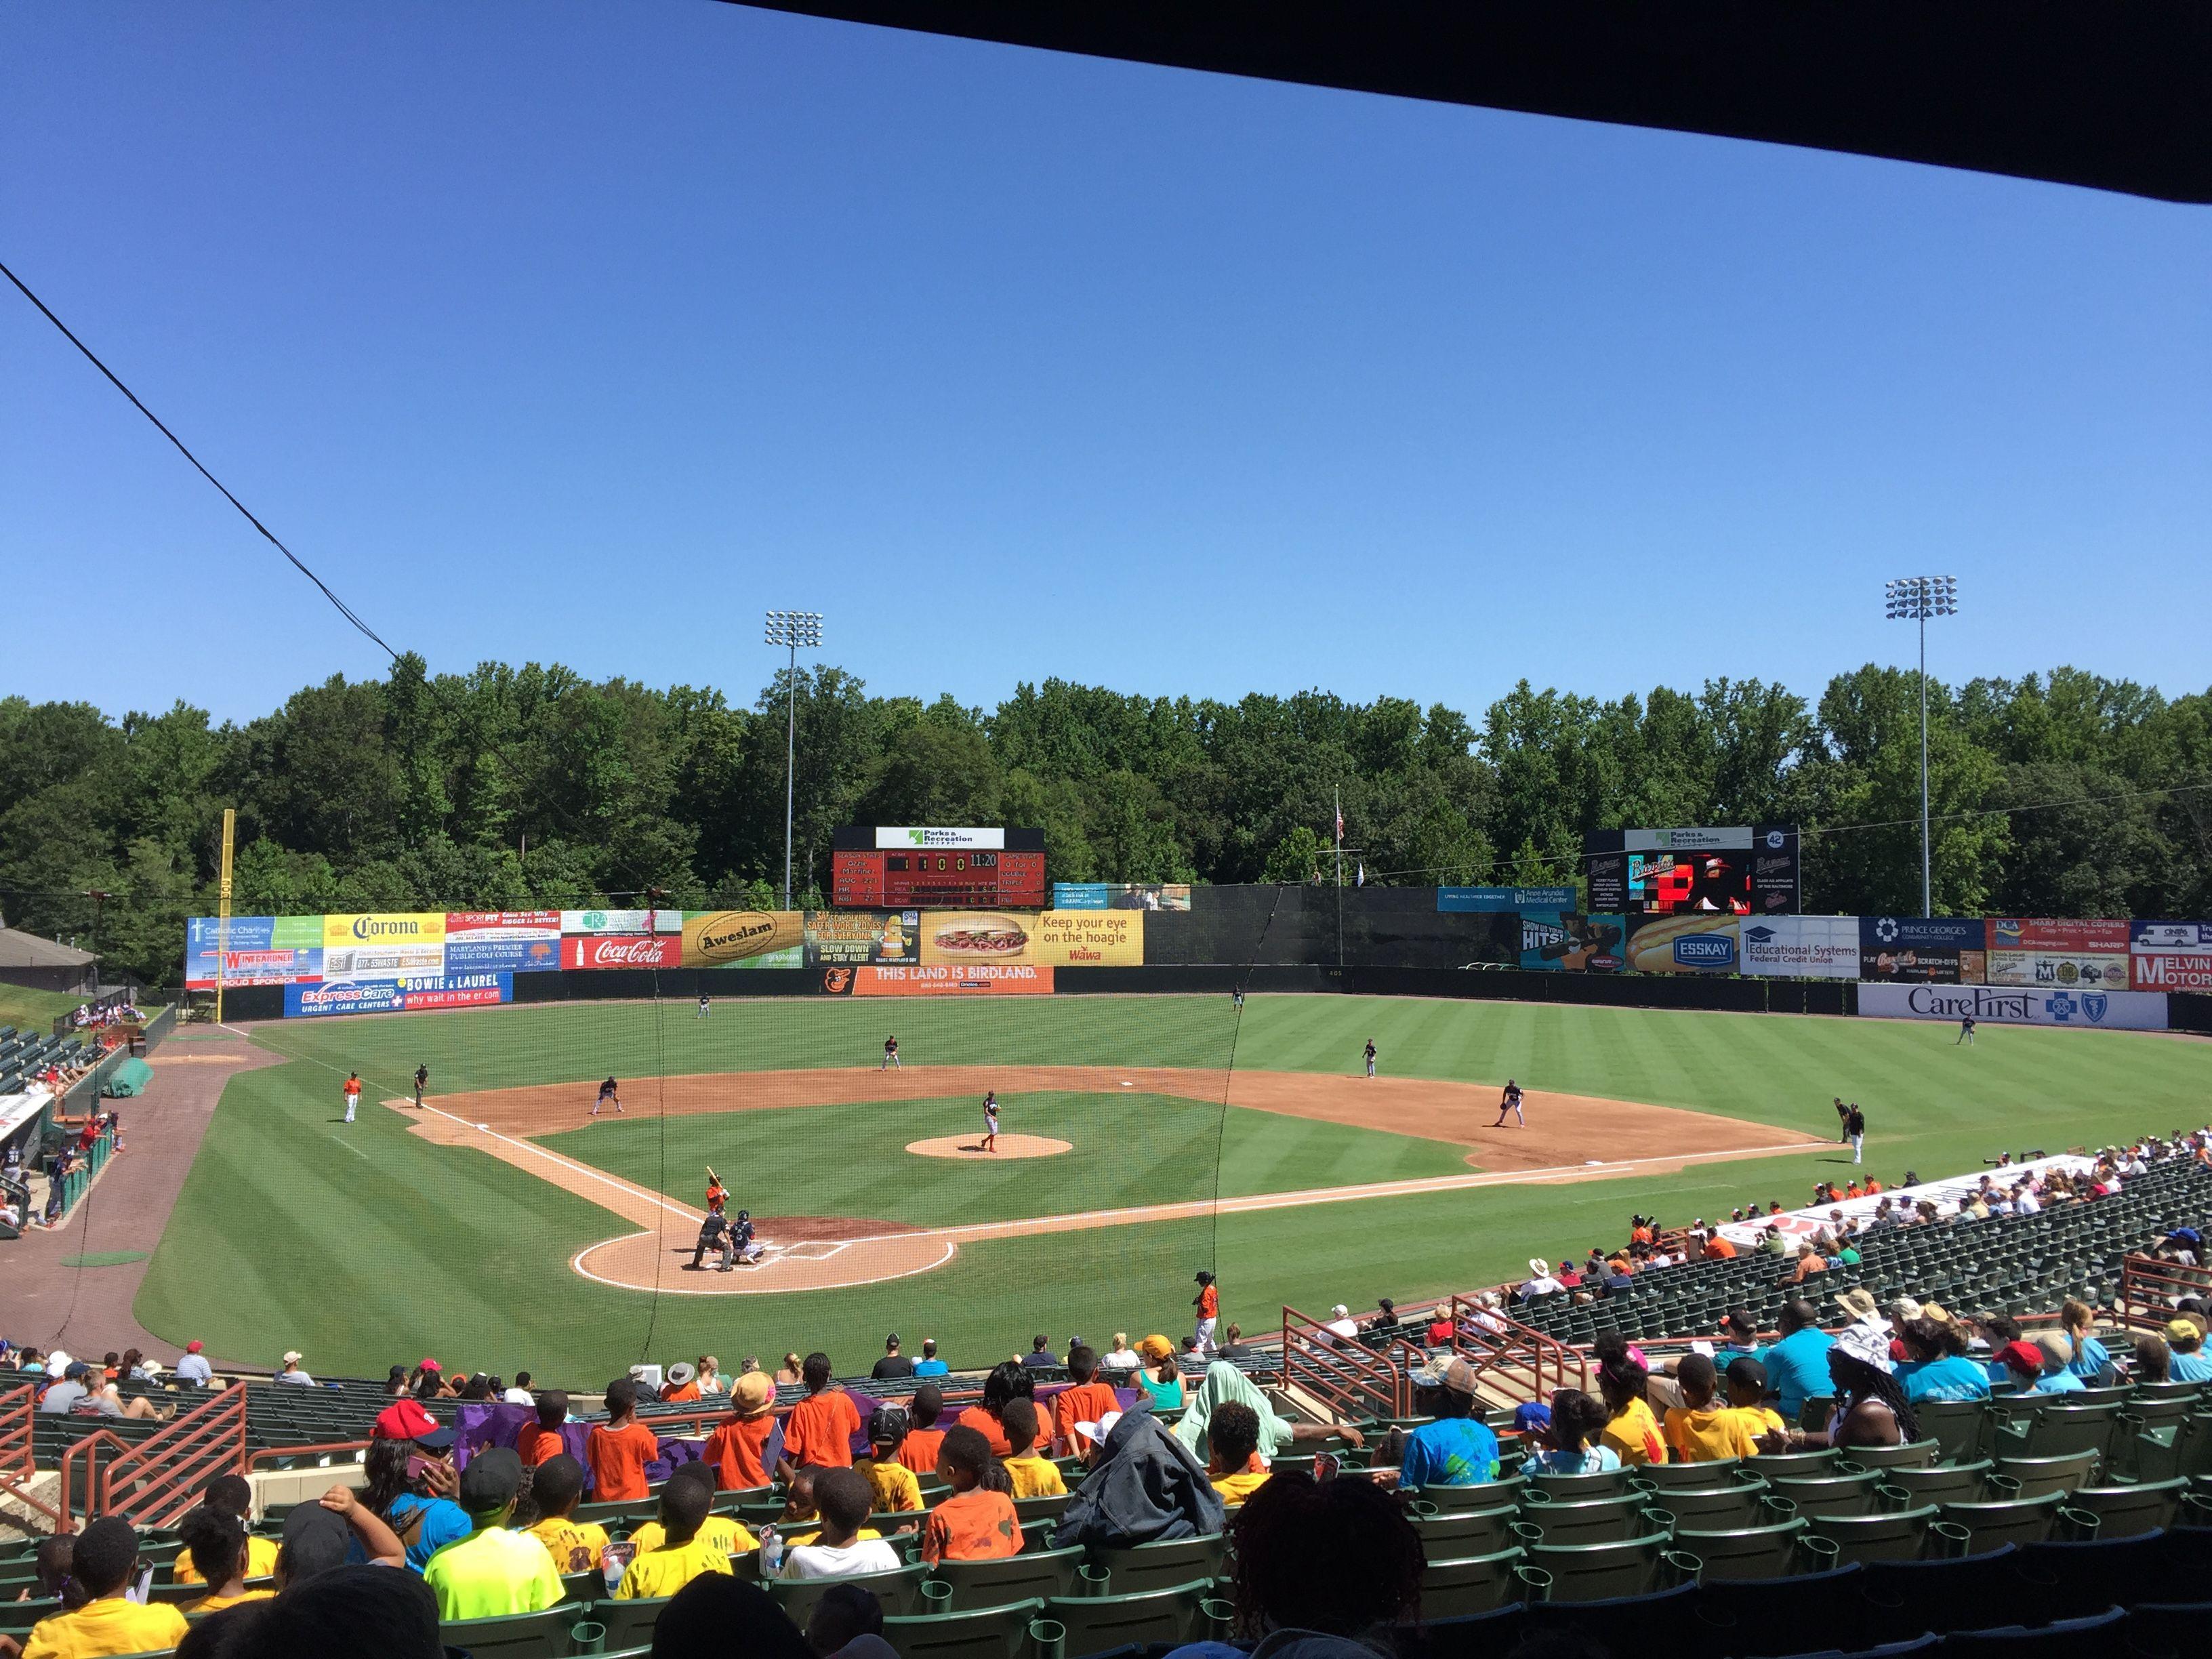 Prince George S Stadium Bowie Baysox Baseball Stadium Stadium Baltimore Orioles